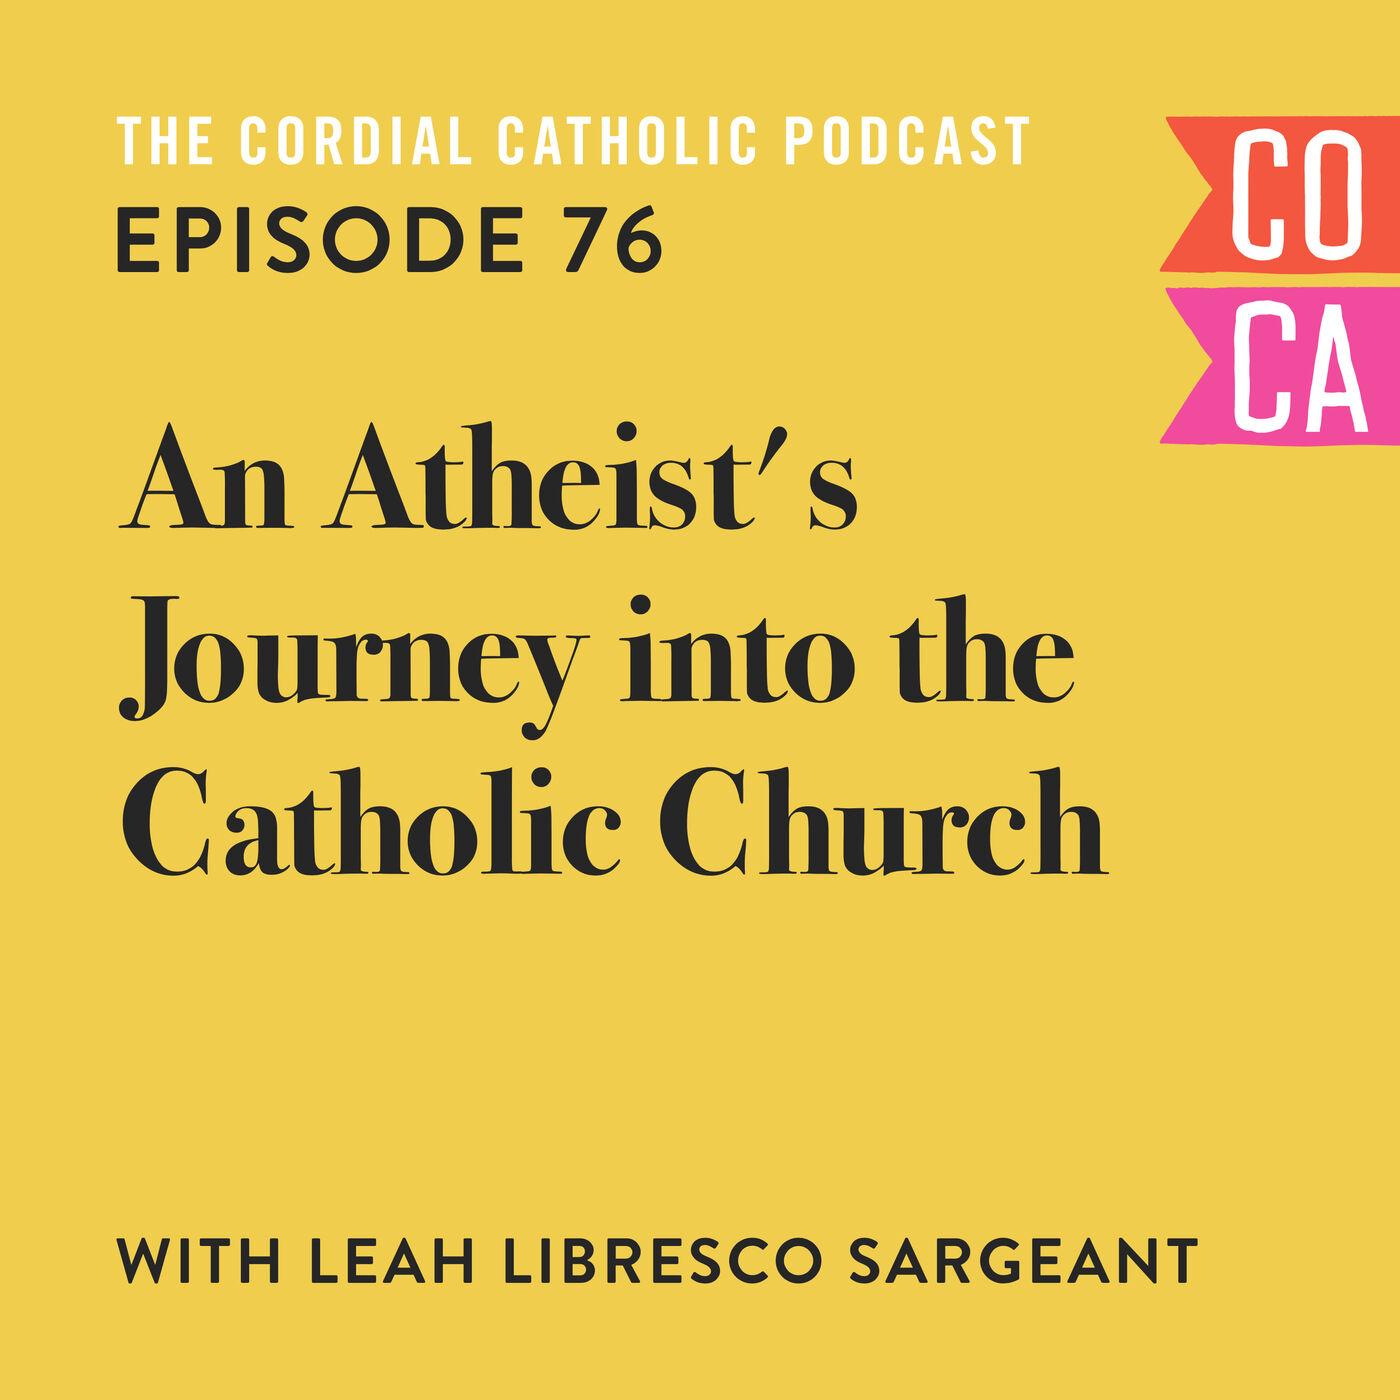 076: An Atheist's Journey into the Catholic Church (w/ Leah Libresco Sargeant)